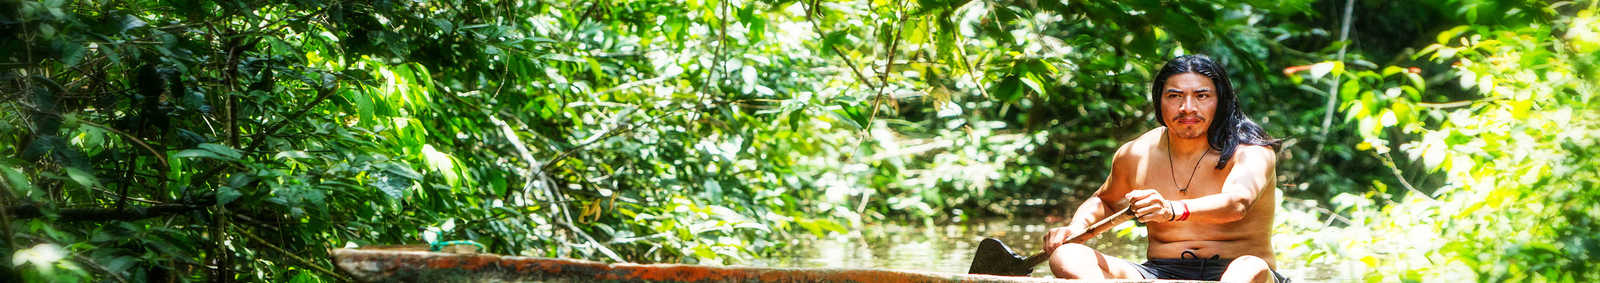 Indigenous man canoeing through the Amazon jungle, Ecuador